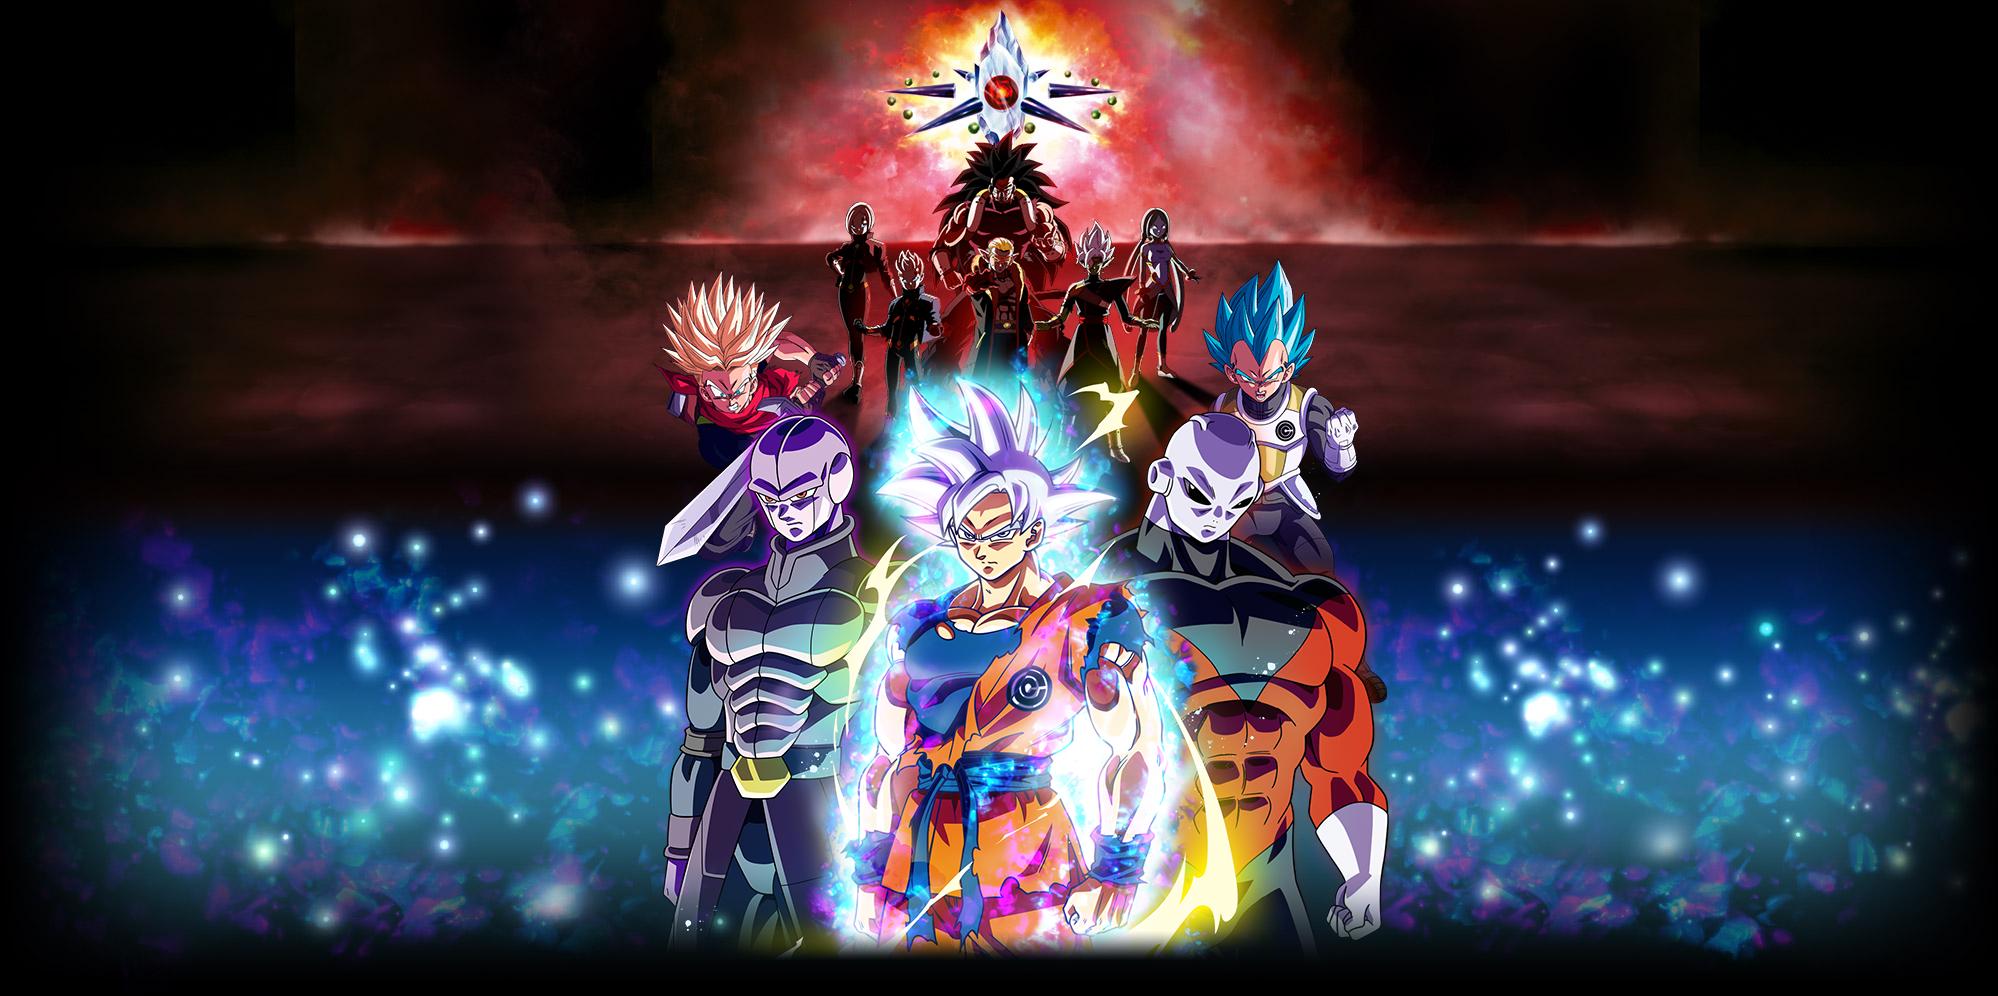 Super Dragon Ball Heroes Wallpaper Website By Maxiuchiha22 On